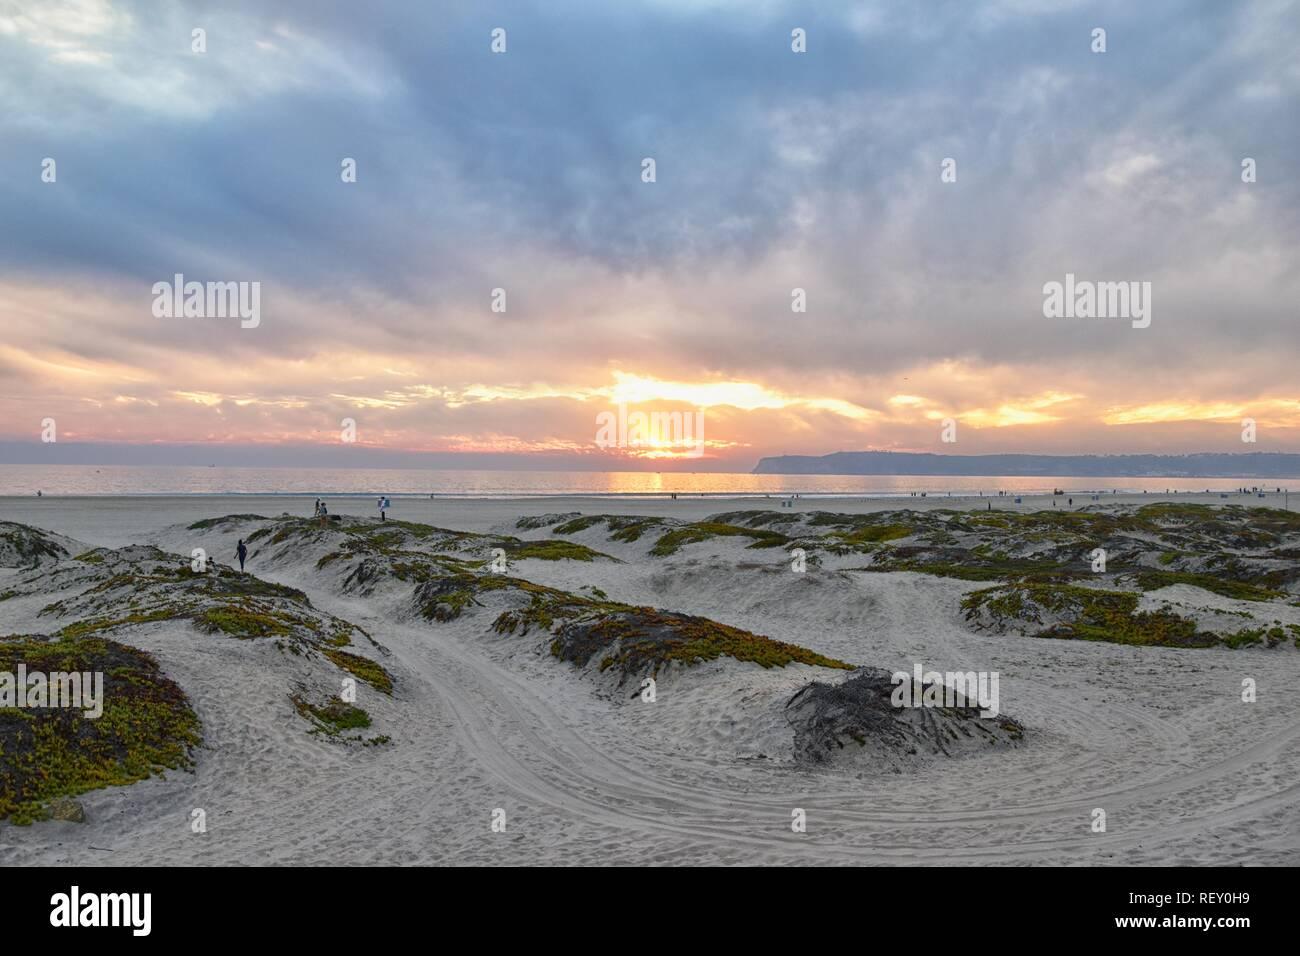 ca028d5553 Coronado Island Sunrise Stock Photos   Coronado Island Sunrise Stock ...